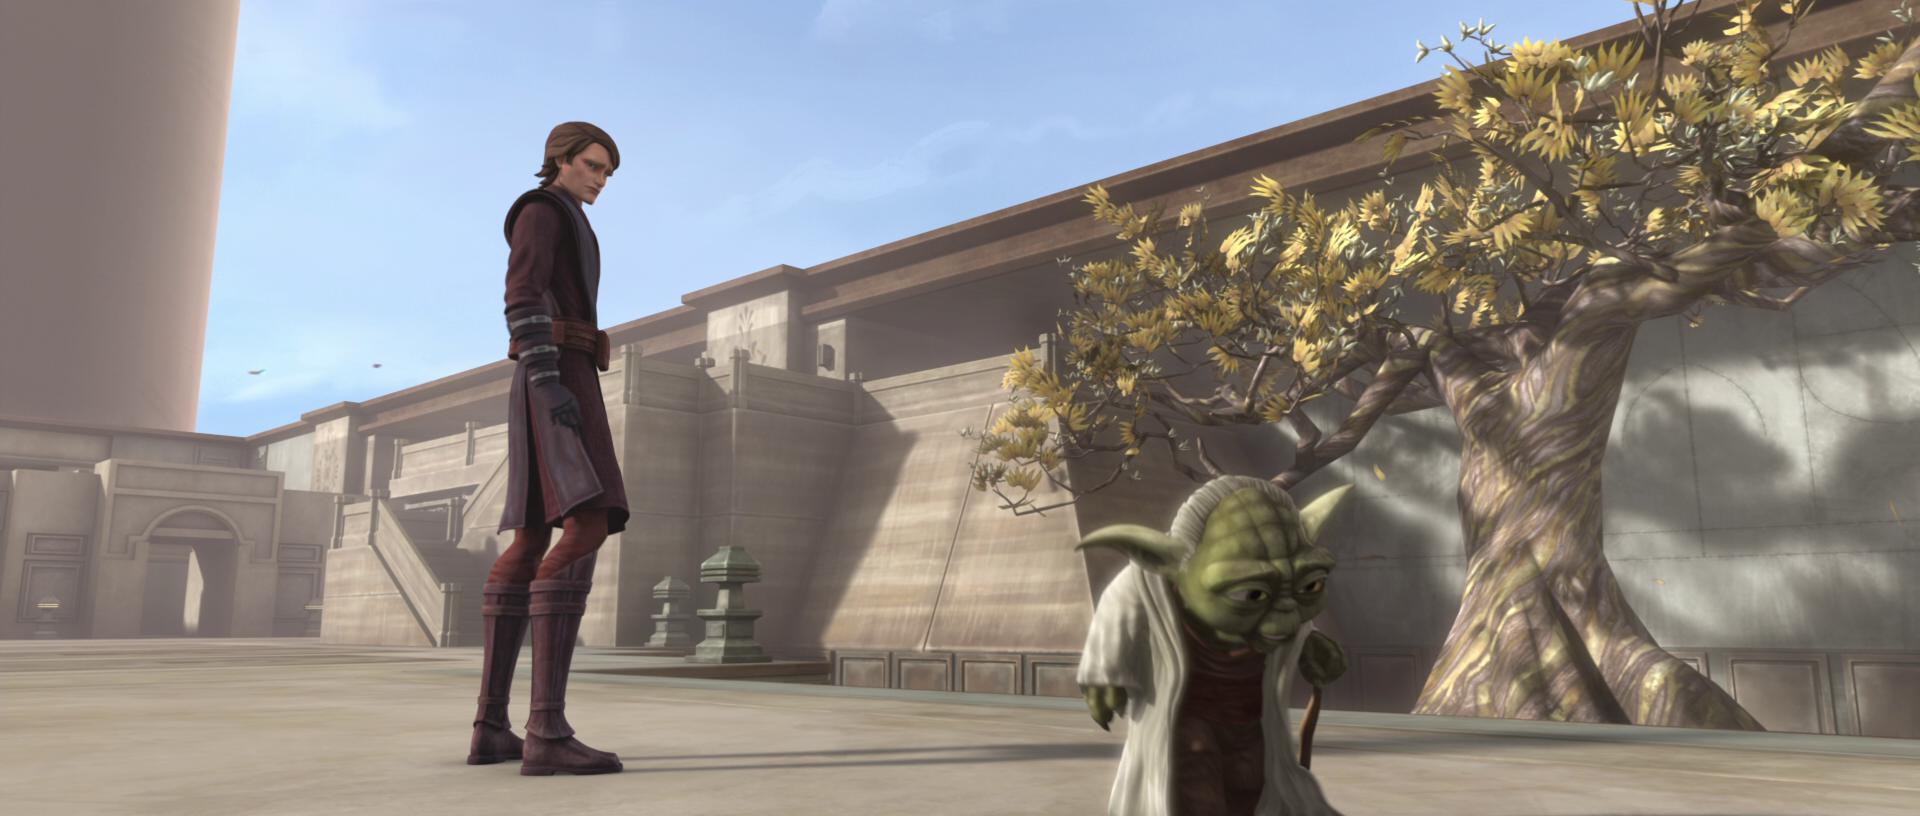 Jedi Temple training ground